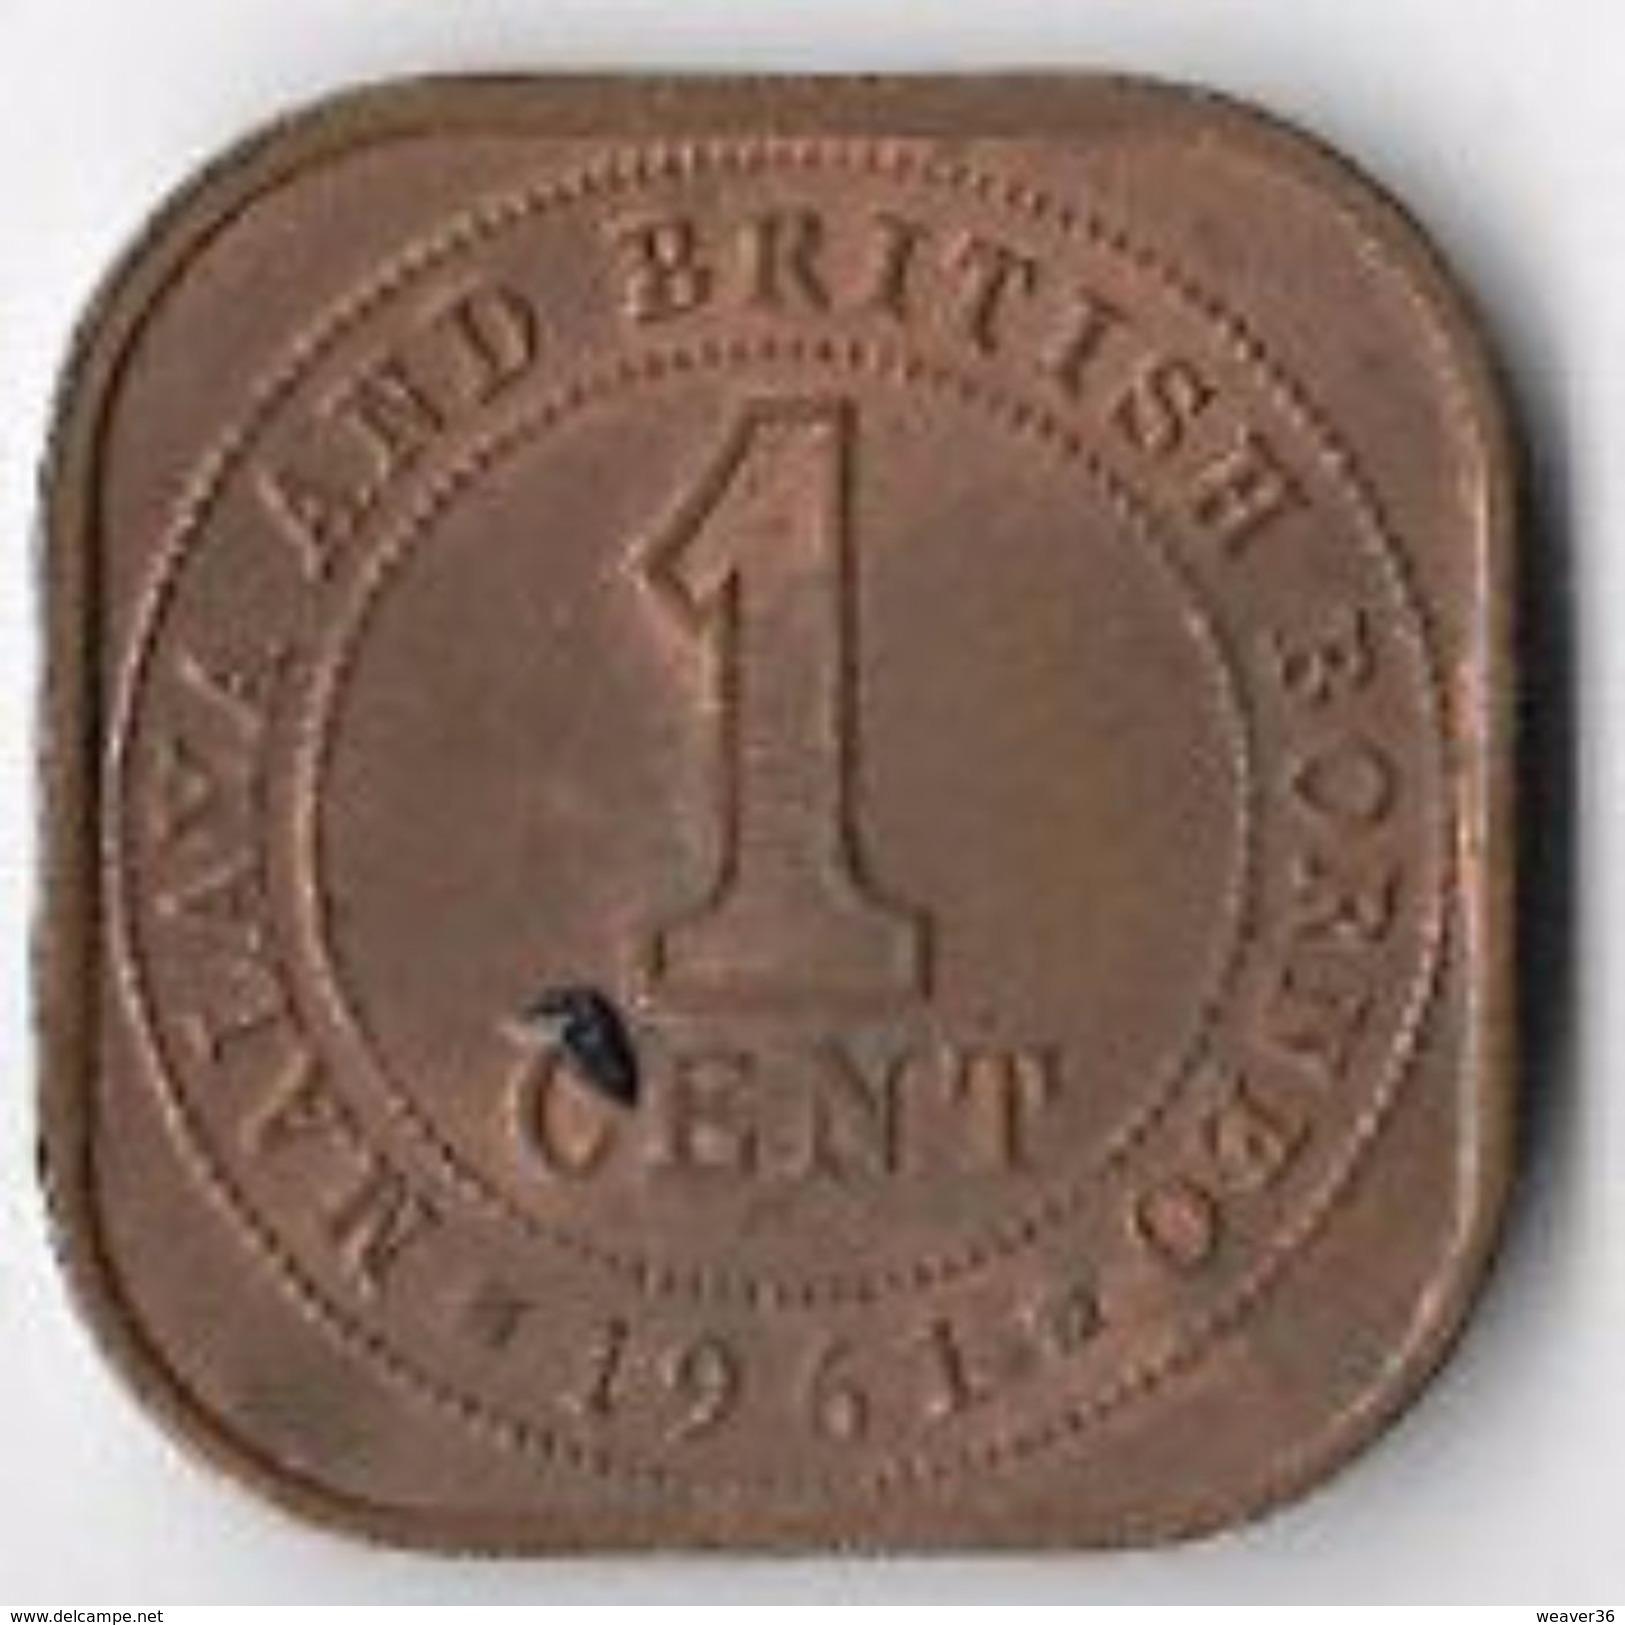 Malaya And British Borneo 1961 1 Cent [C547/2D] - Coins